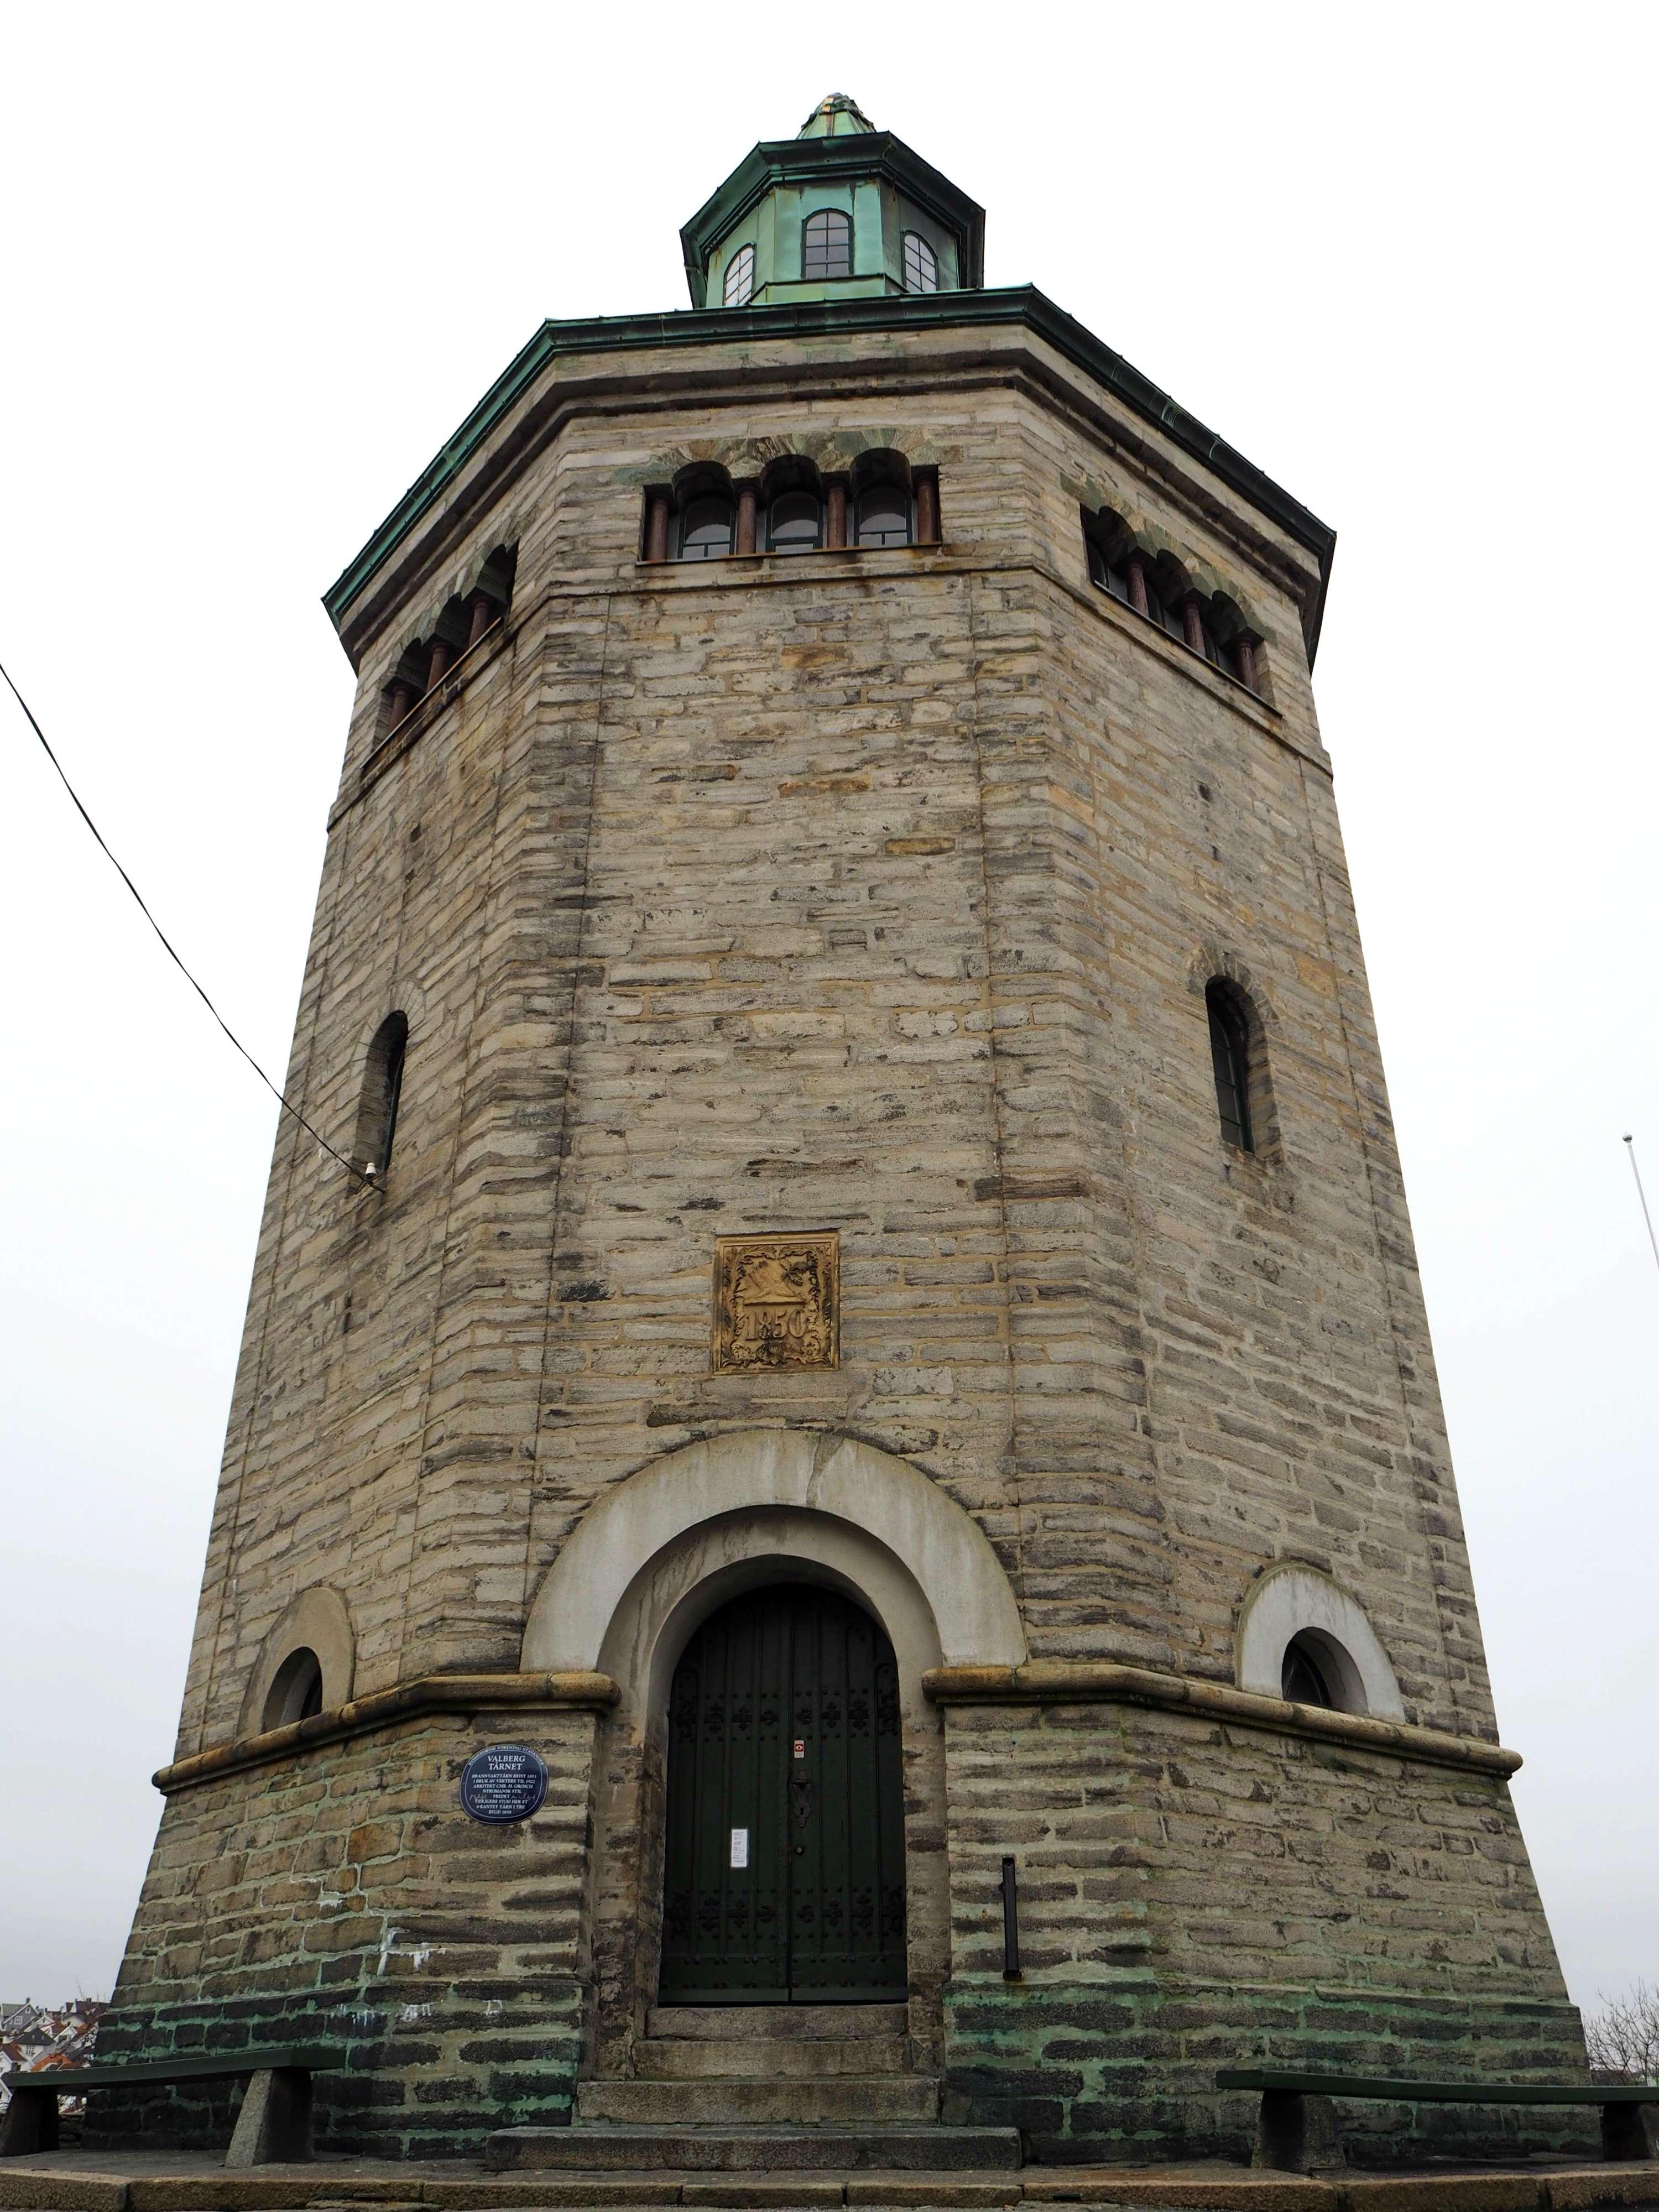 Valbergtårnet in Stavanger